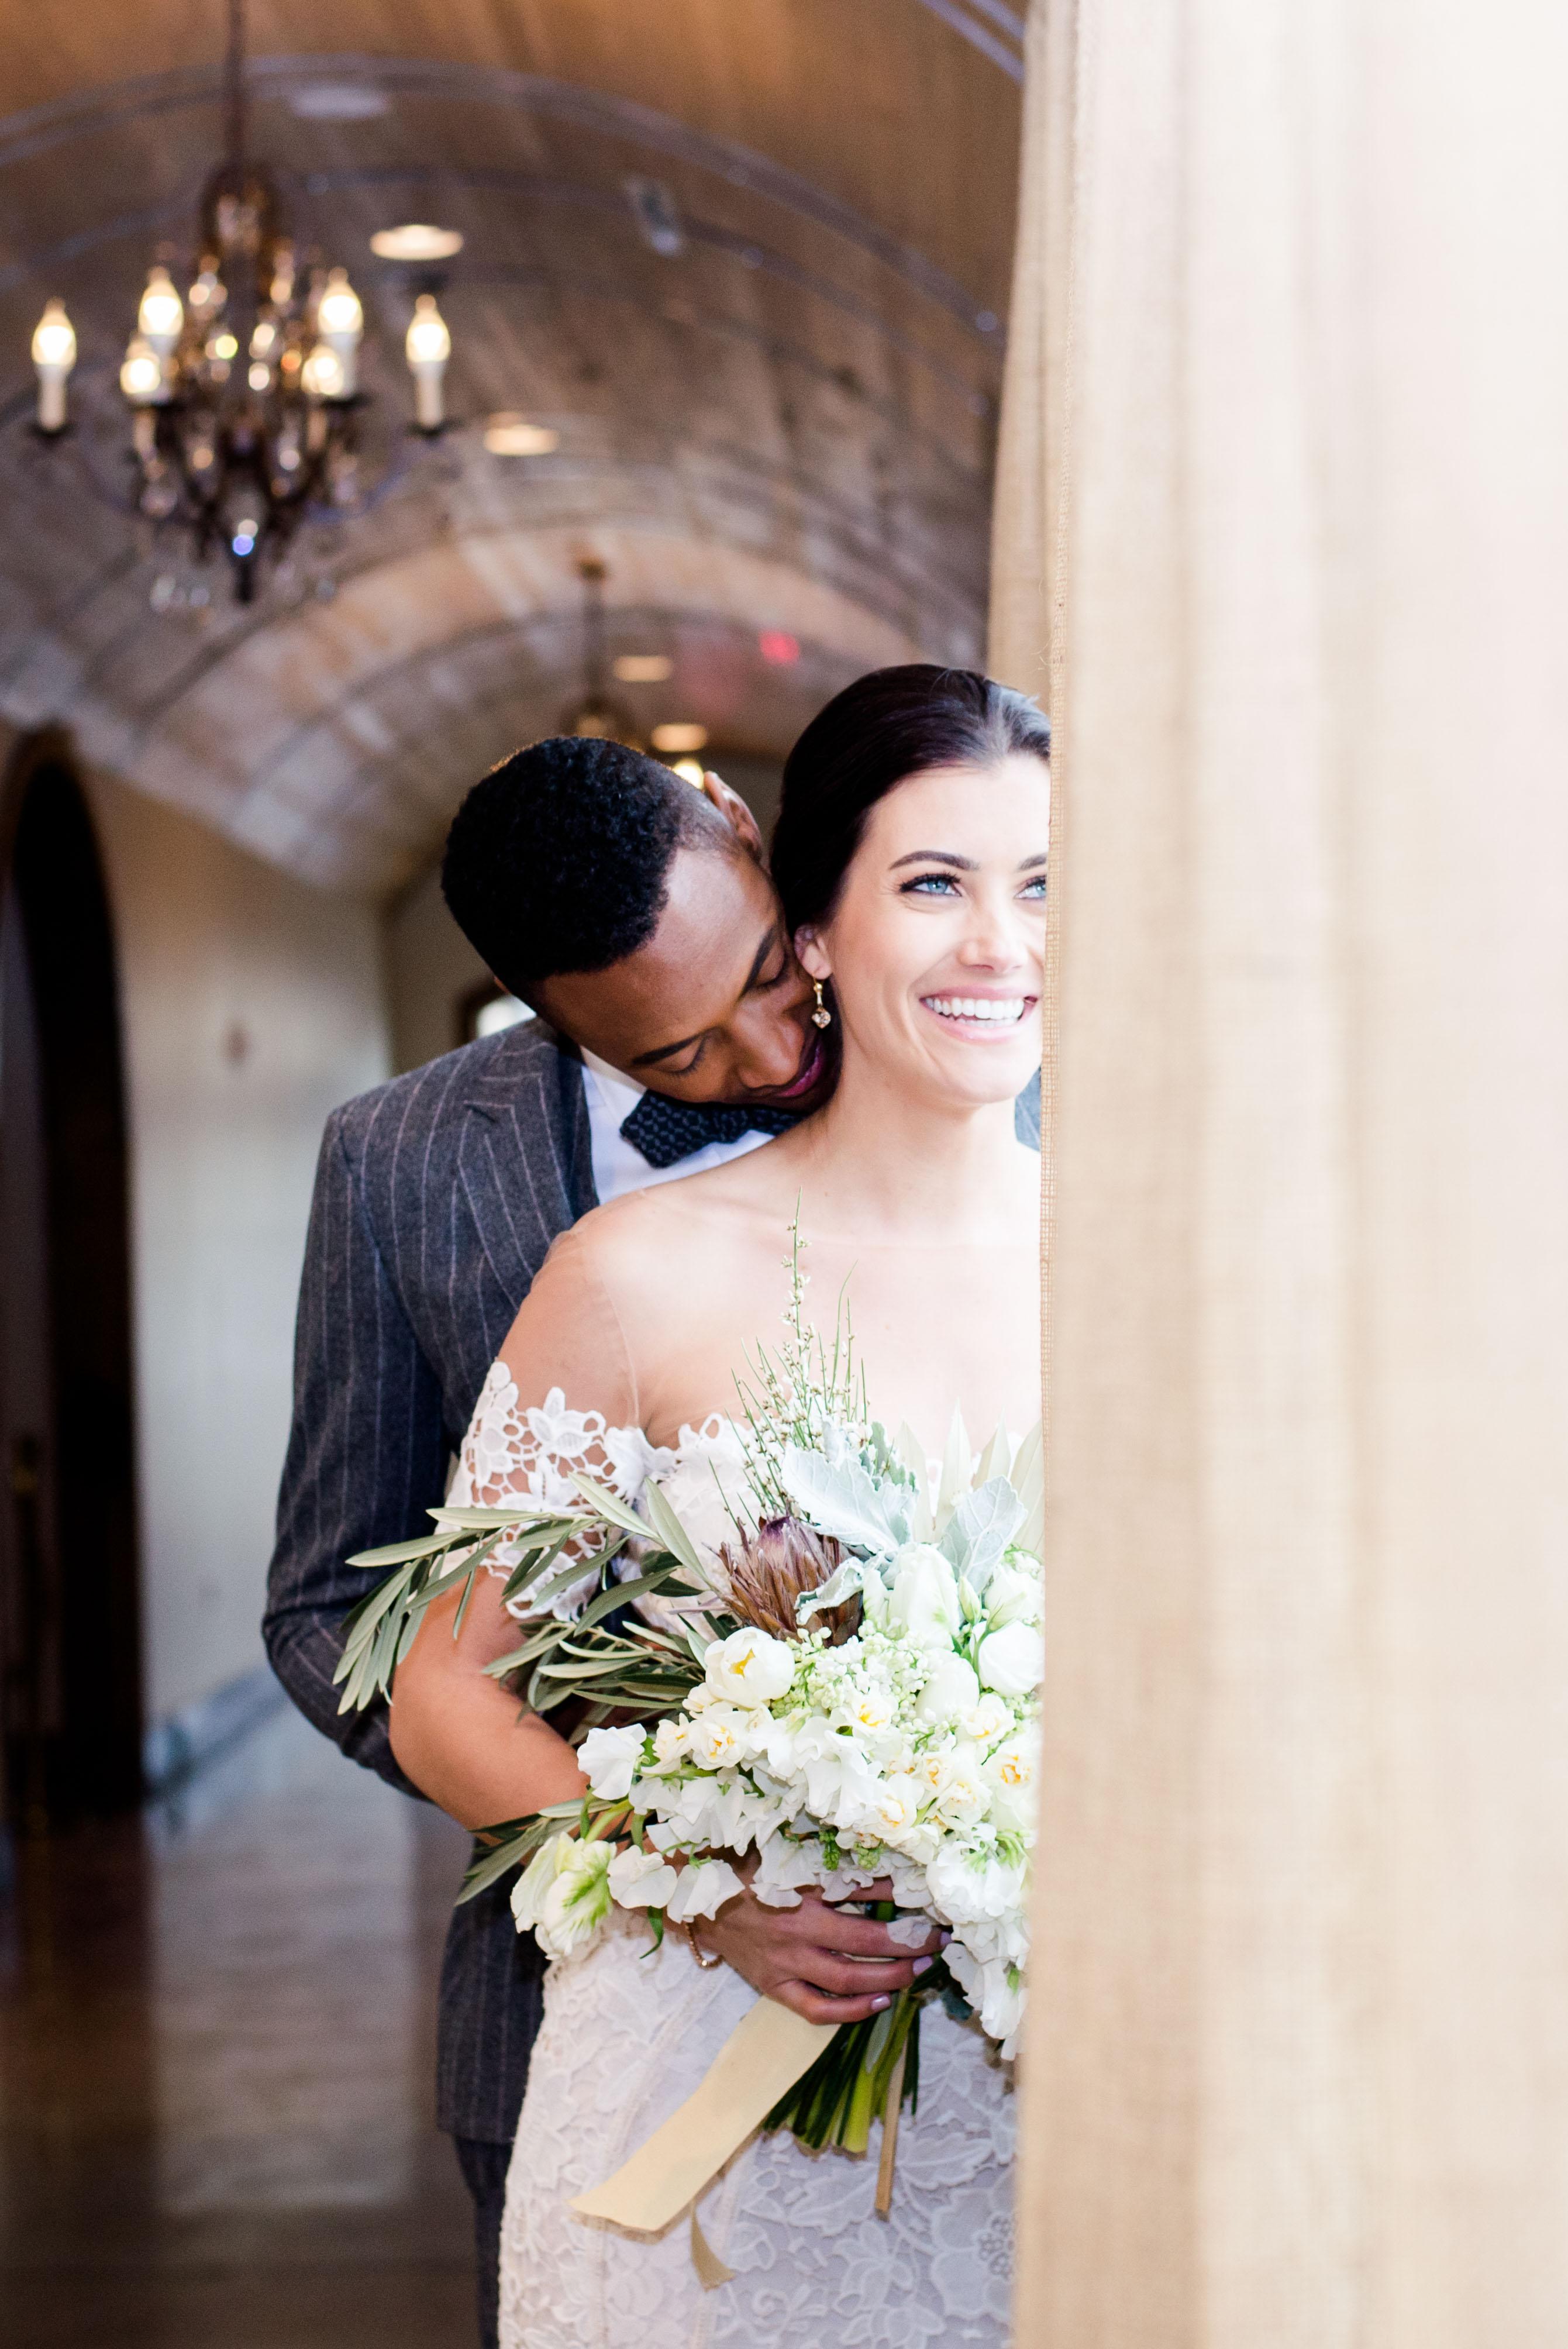 Folino-Estate-Kutztown-Pennsylvania-Vineyard-Country-Wedding-Andrea-Krout-Photography-9